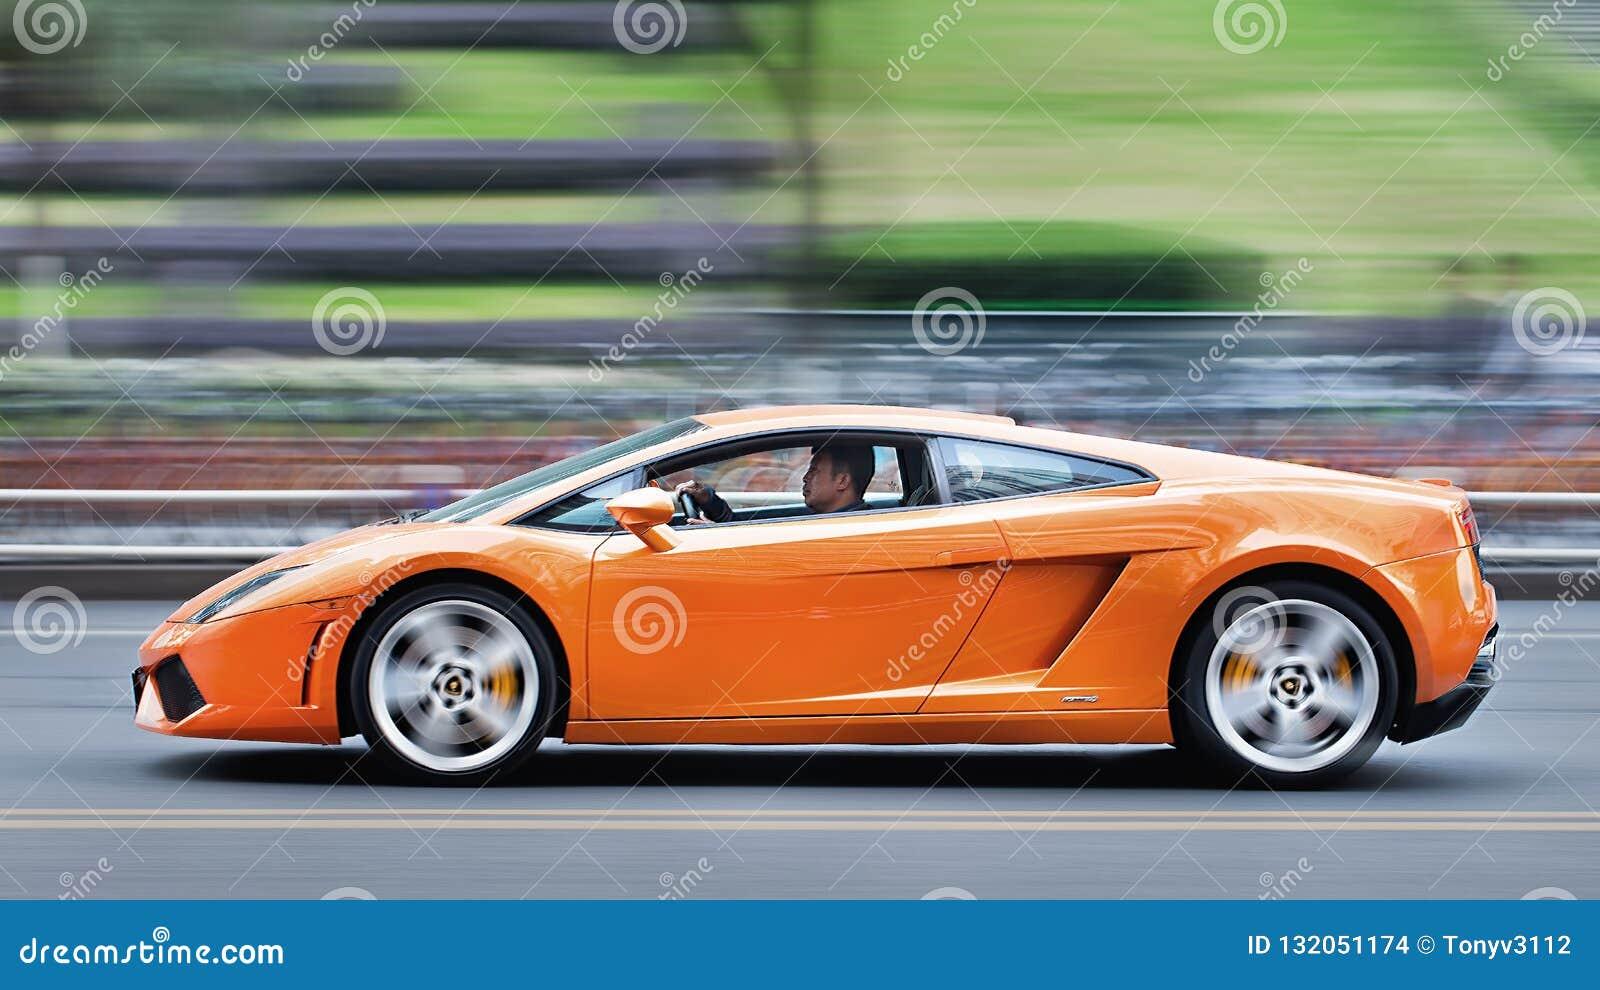 2016 Lamborghini Gallardo >> Orange Lamborghini Gallardo Riding On The Street Shanghai Editorial